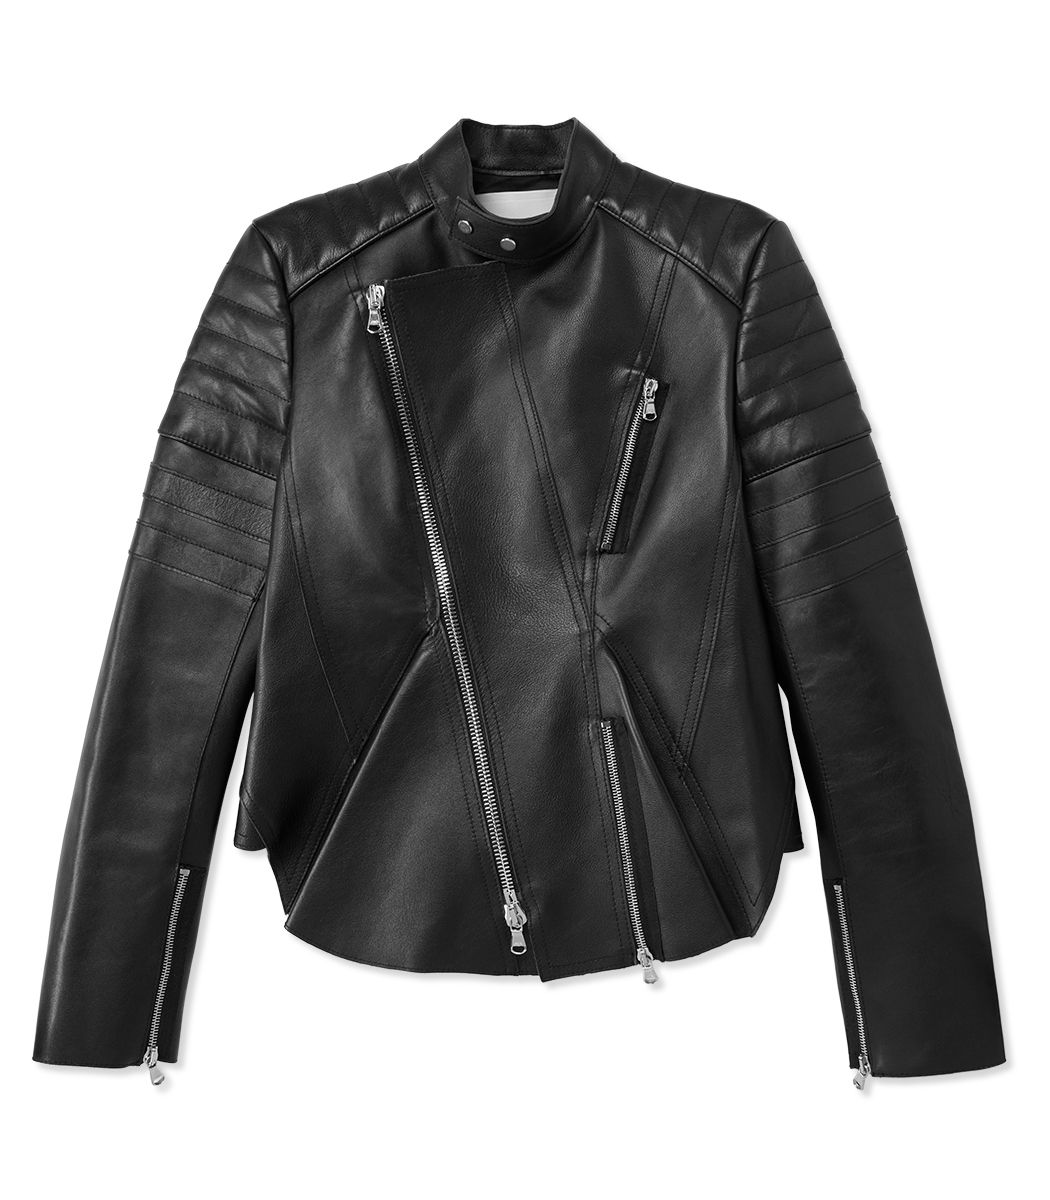 #ShopBAZAAR Editors' Most Wanted – 3.1 Phillip Lim Black Moto Leather Peplum Jacket